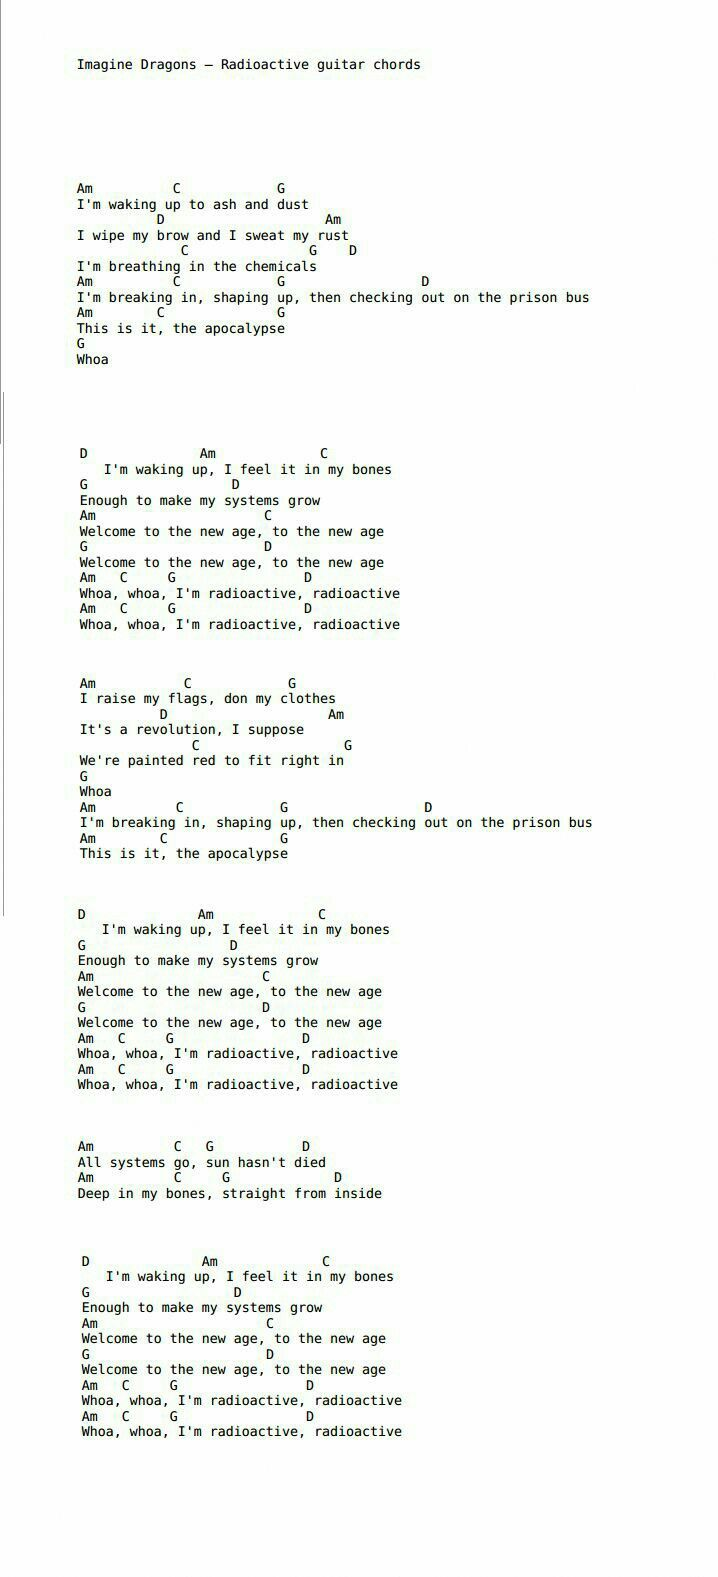 Imagine Dragons Radioactive Guitar Chords Ukulele Chords Songs Ukulele Songs Guitar Chords For Songs